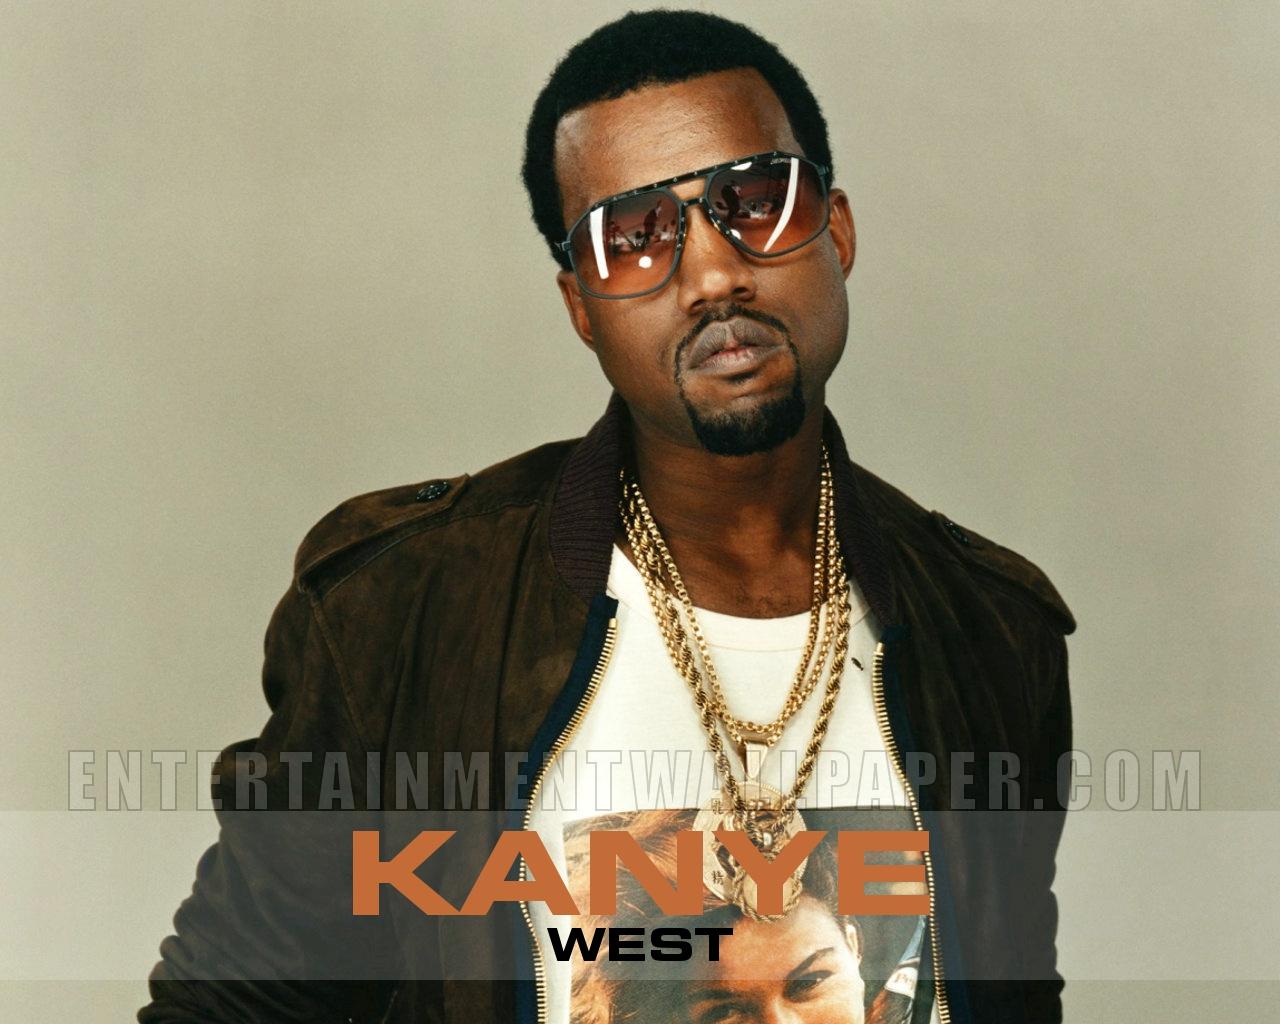 Kanye West Desktop Wallpaper Screensaver Background Hd Artwork Power 1280x1024